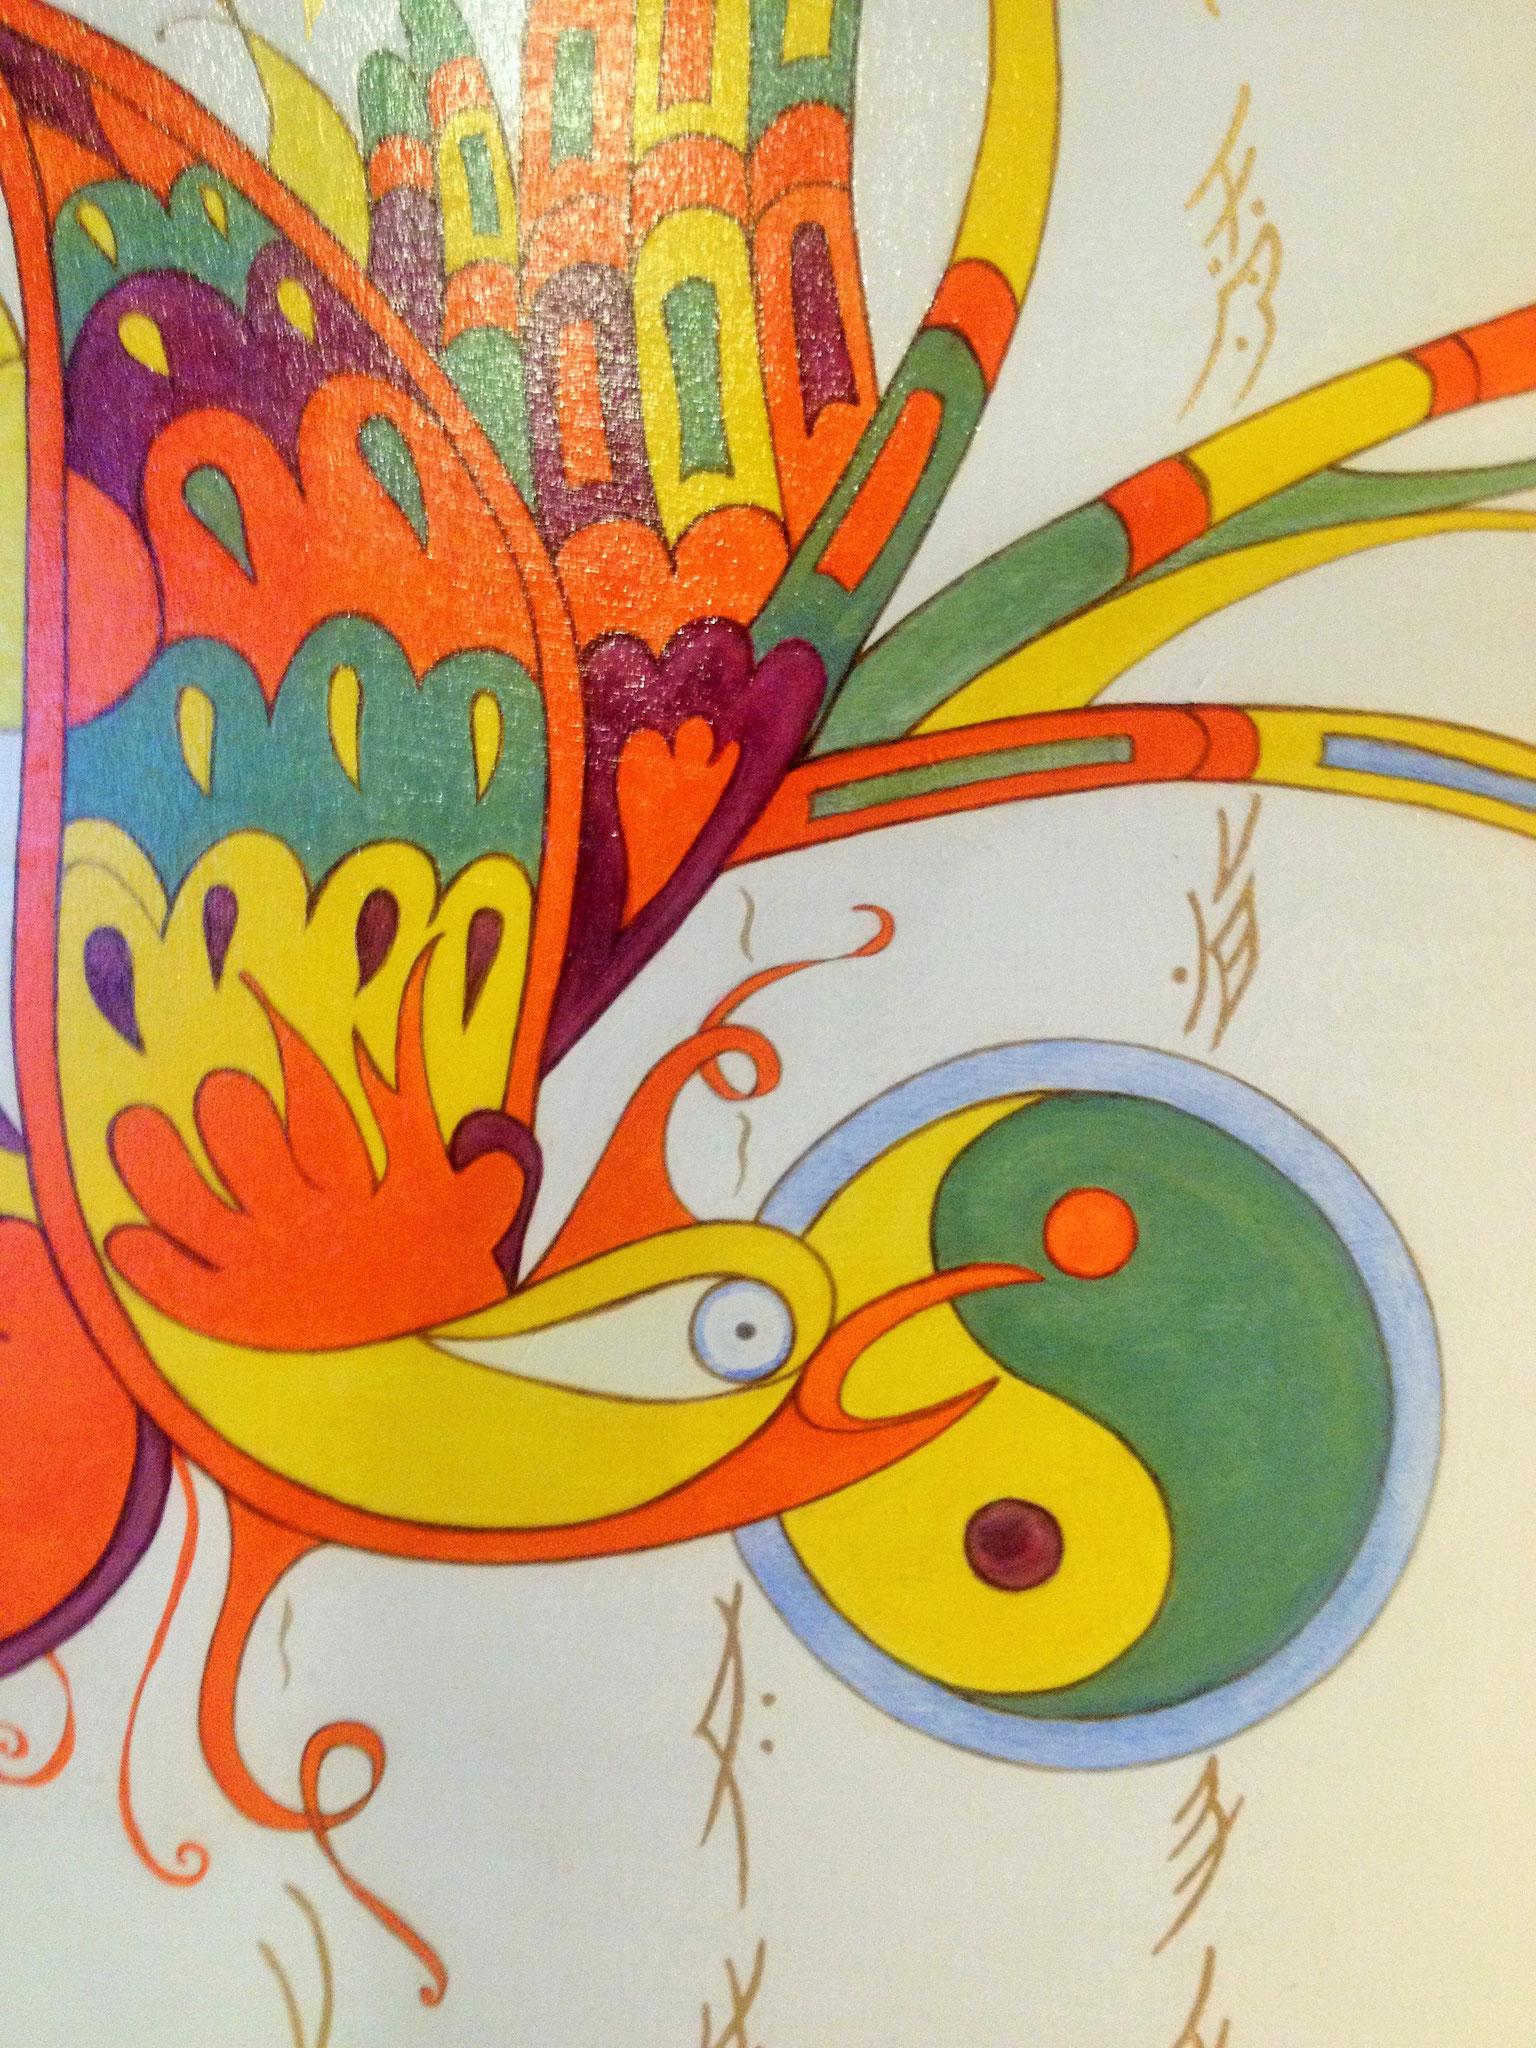 Oiseau Nüshu, acrylique, grand format, feuille d'or. Création Martine Saussure-Young